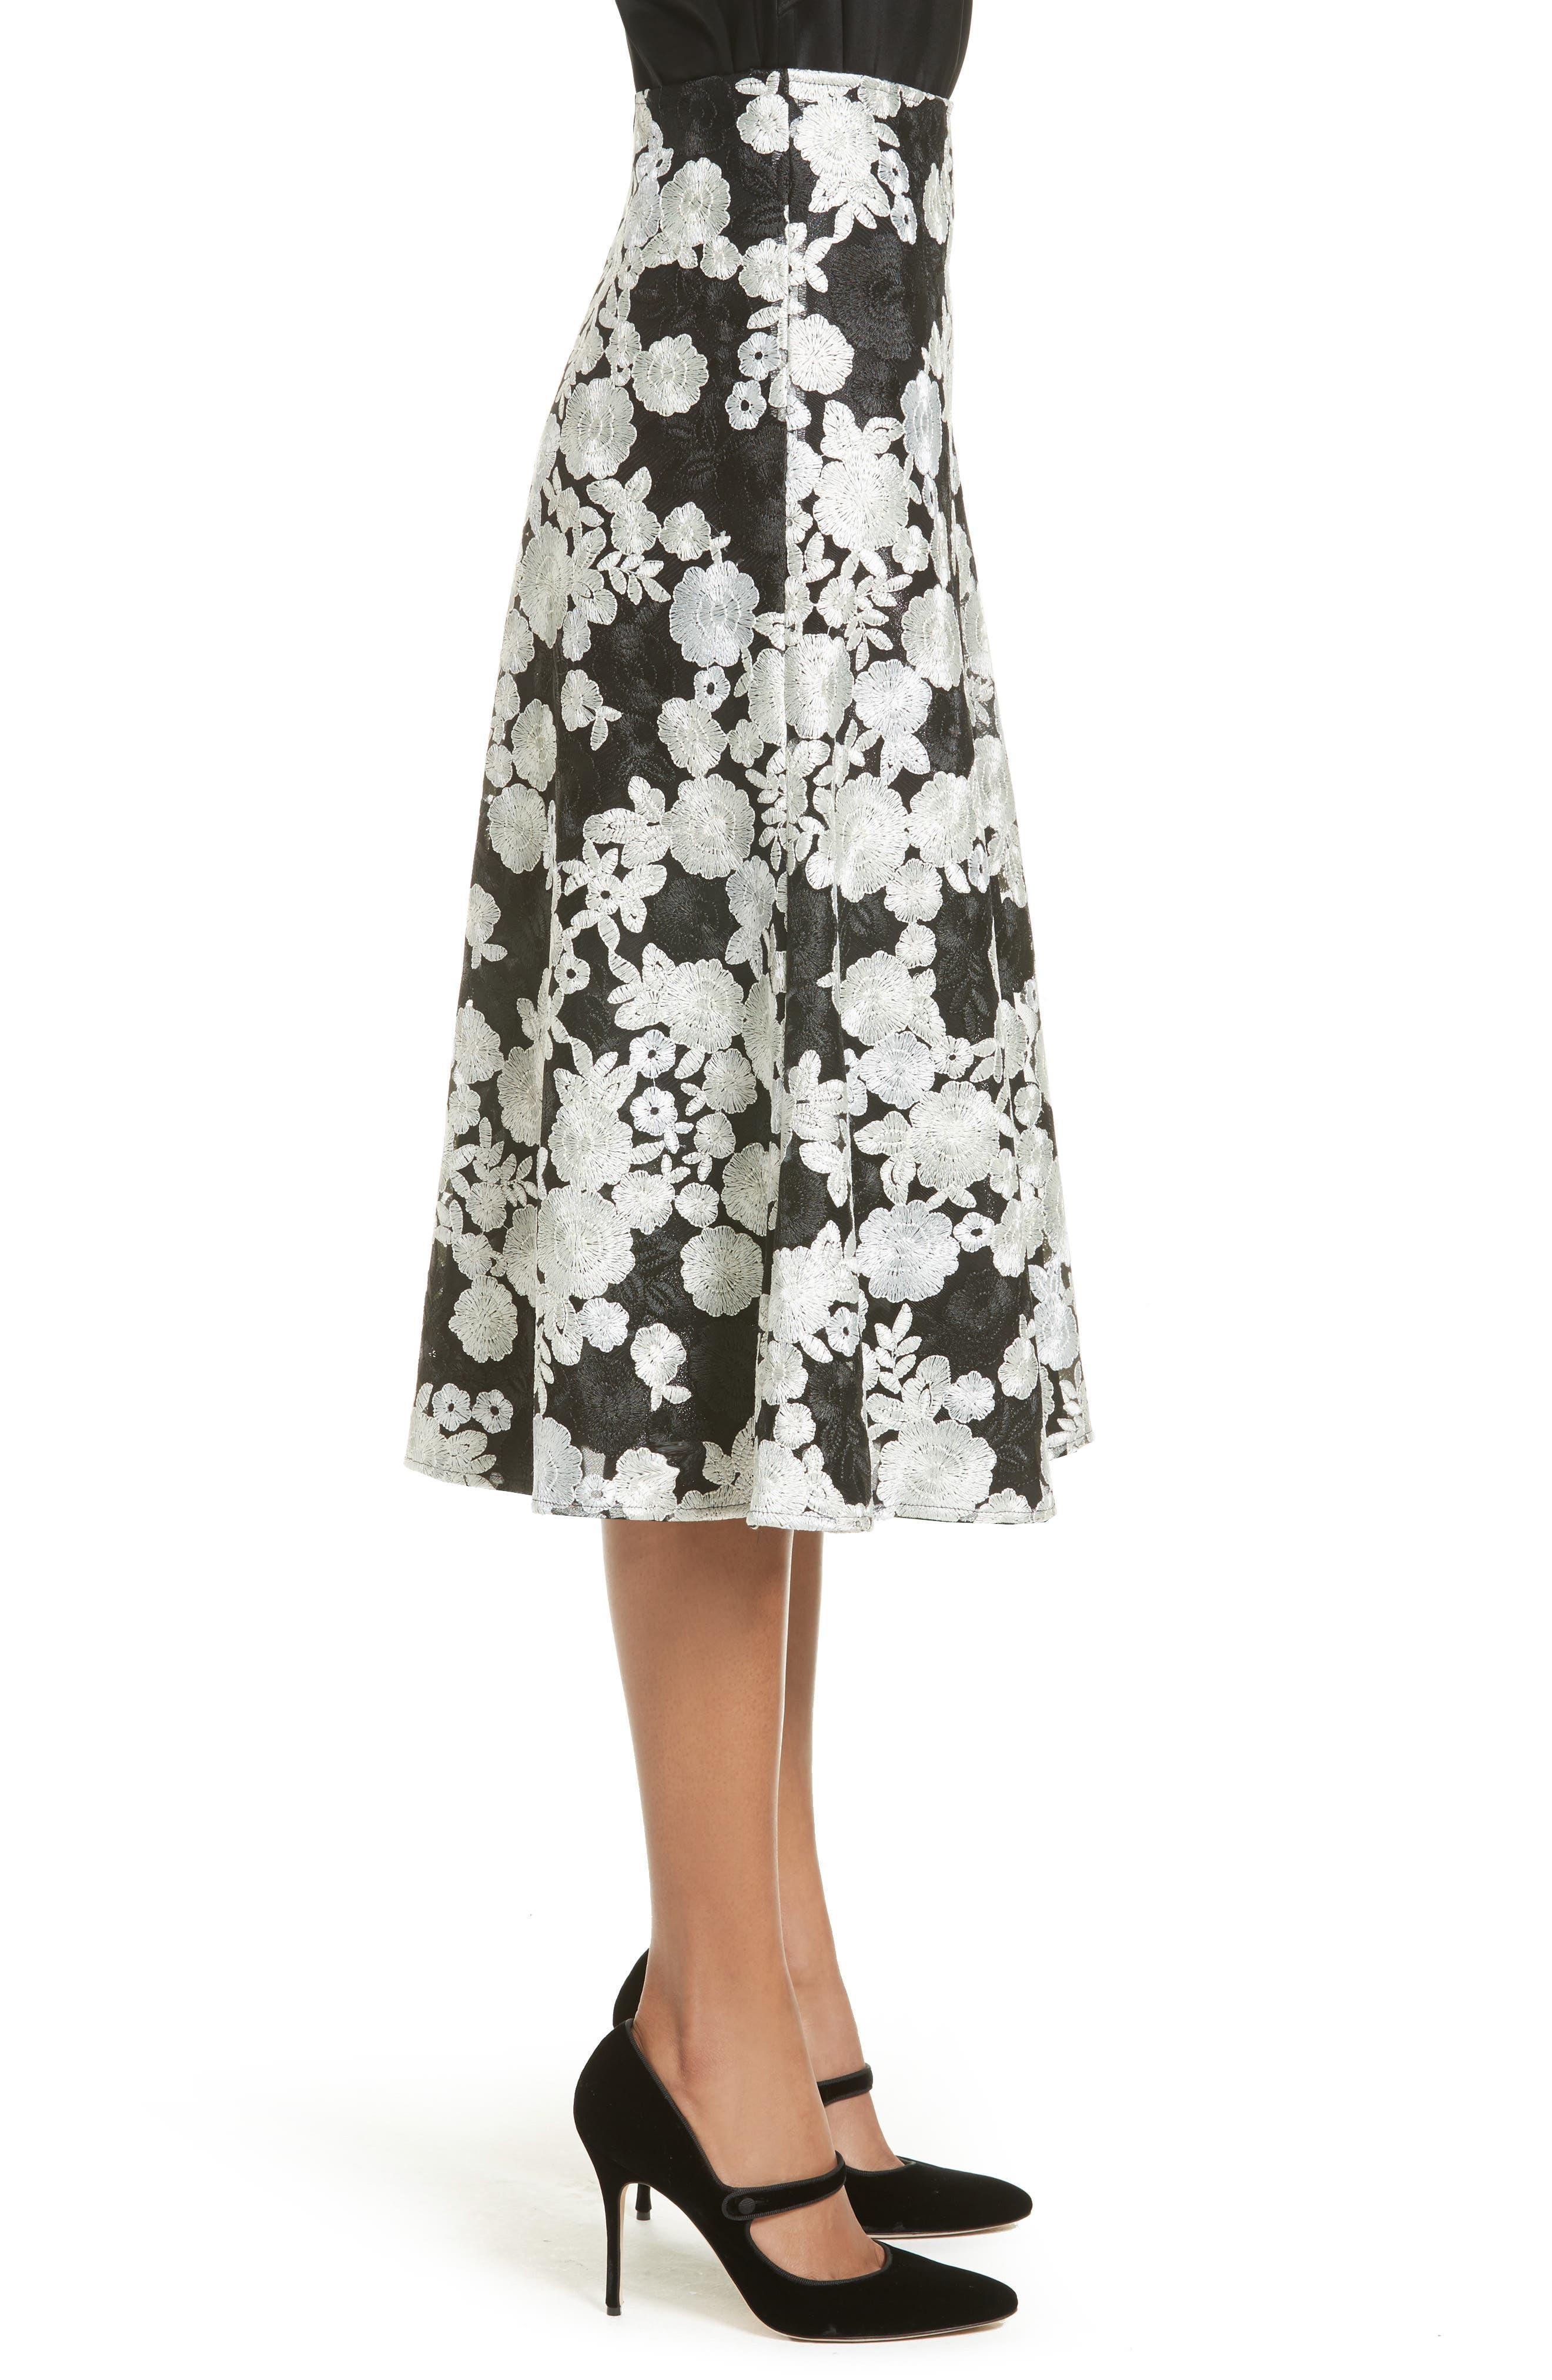 St. John Floral Embroidered Flared Skirt,                             Alternate thumbnail 3, color,                             Caviar Multi